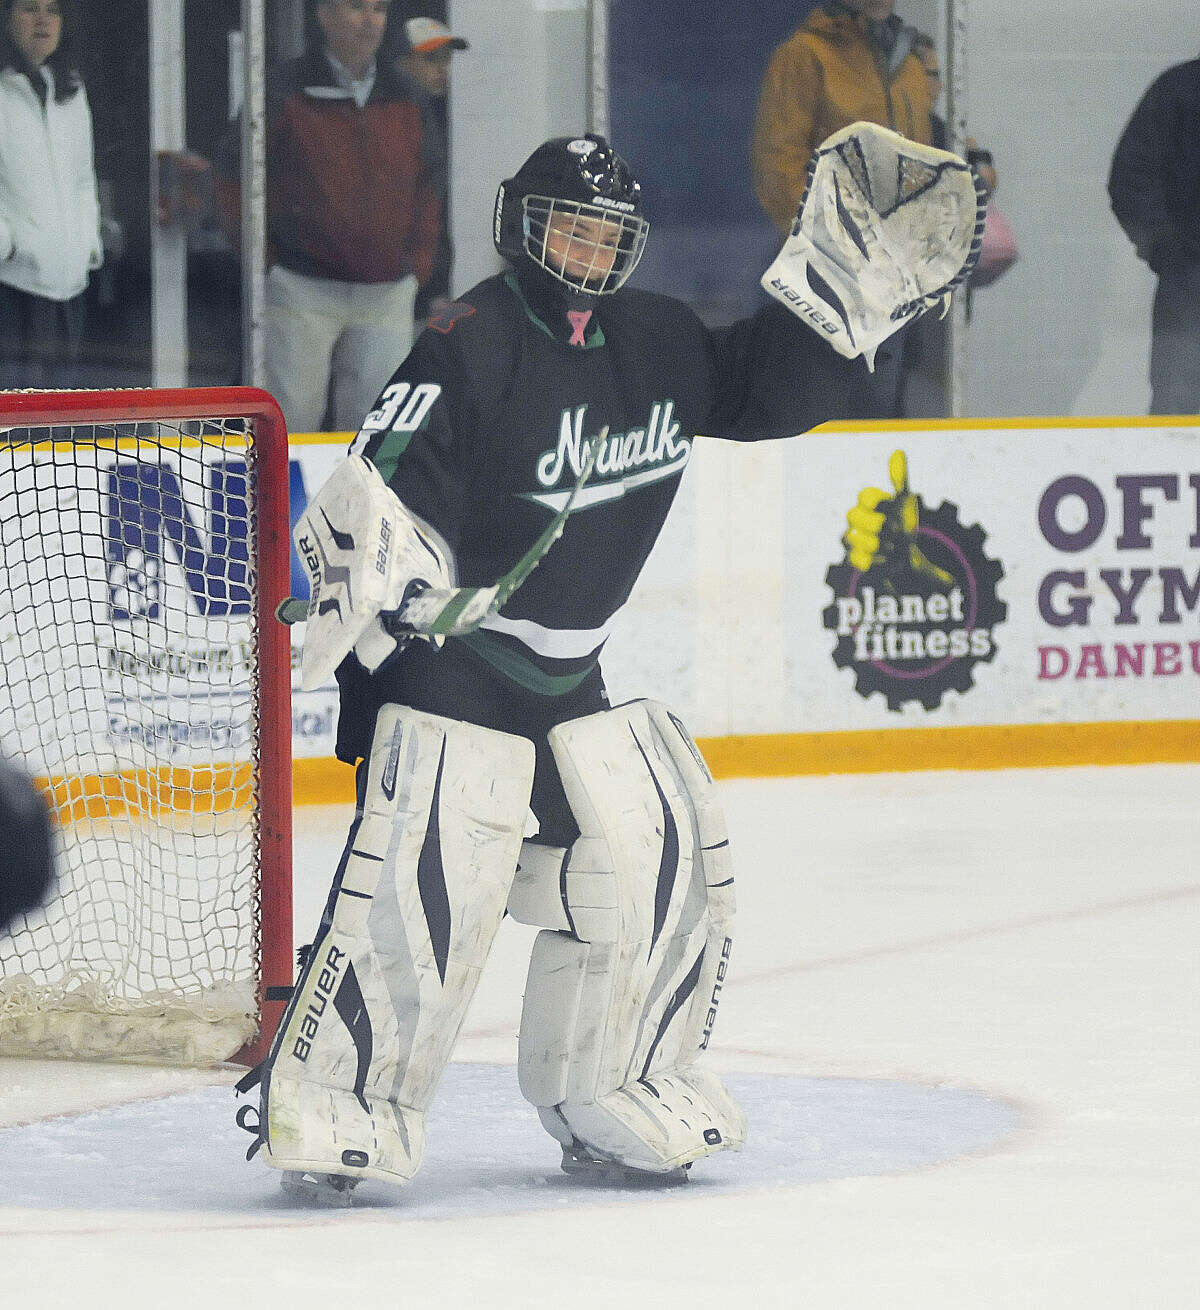 Hour photo/John Nash - Norwalk-McMahon goalie Philip Uva will backstop the co-op team for another season.